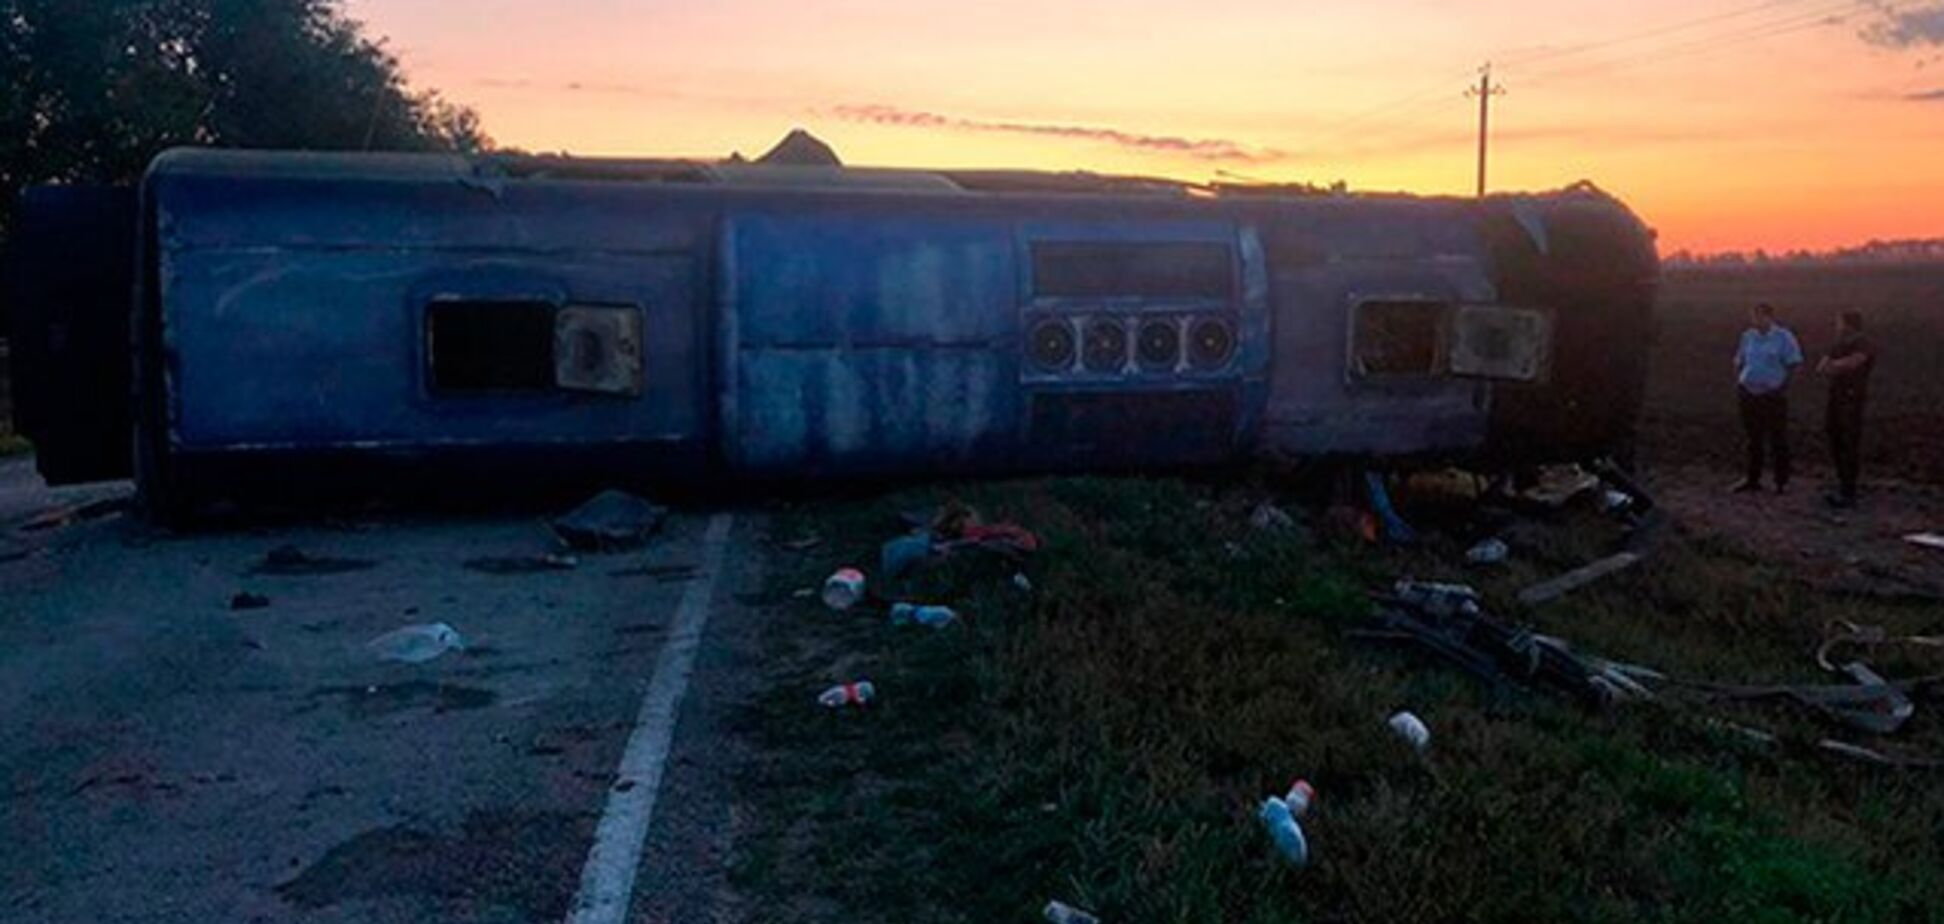 Автобус у м'ясо: в Росії трапилася кривава ДТП. 5 жертв, 18 постраждалих